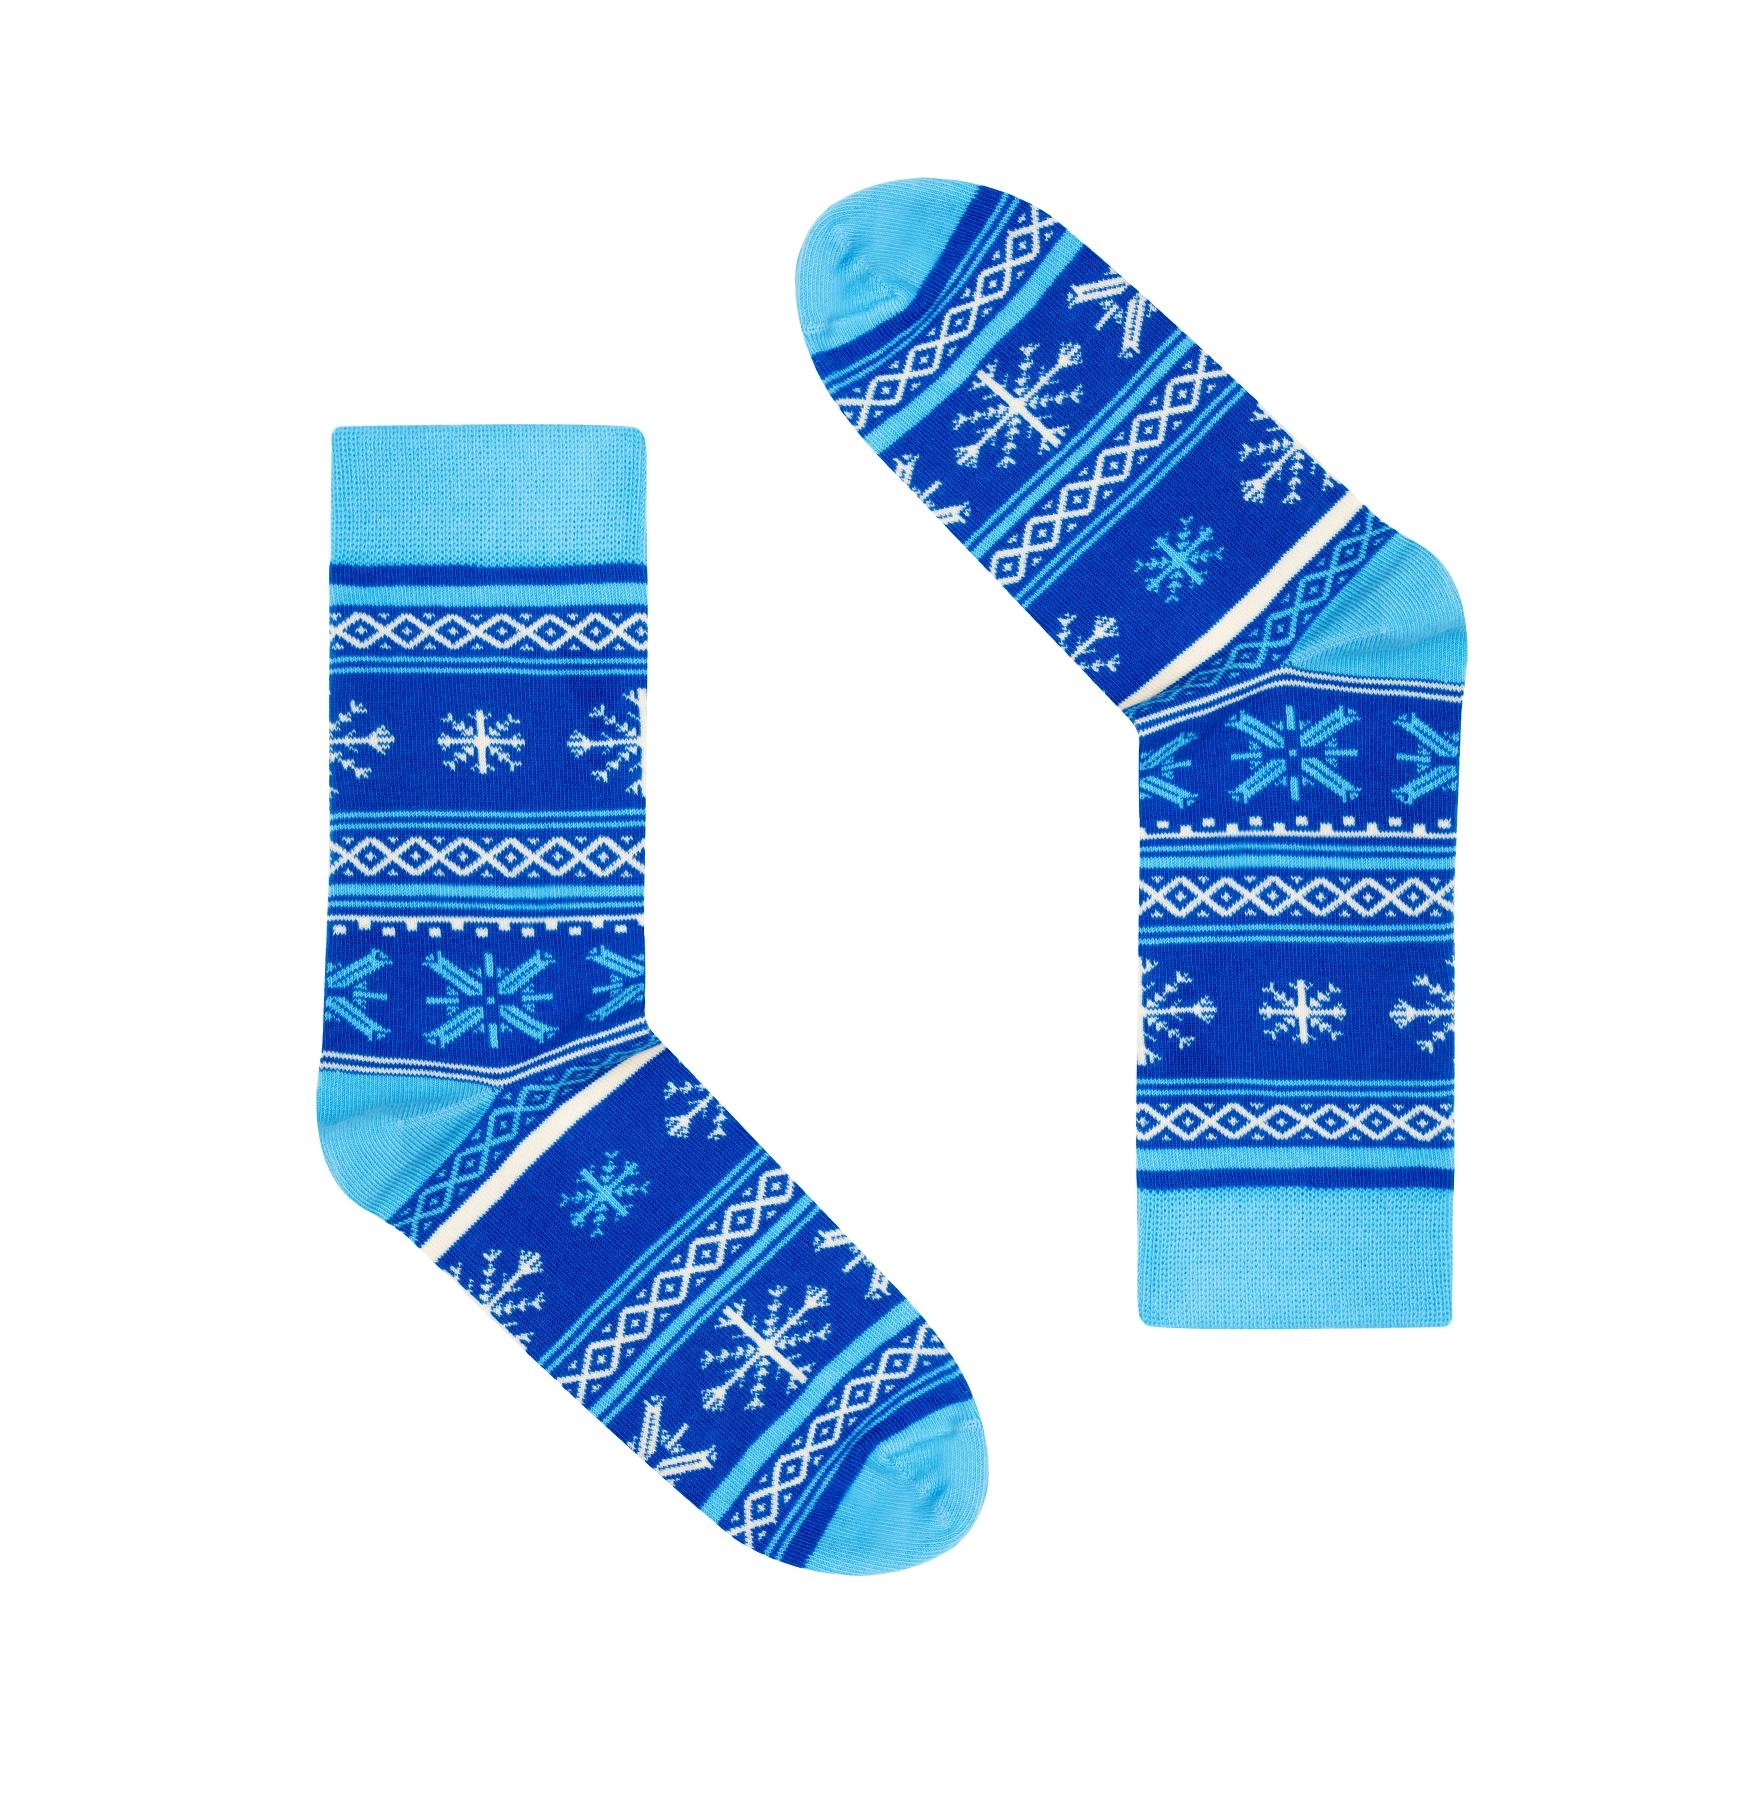 Skarpetki Finlandia Płatki Śniegu 36-41 - FAVES. Socks&Friends